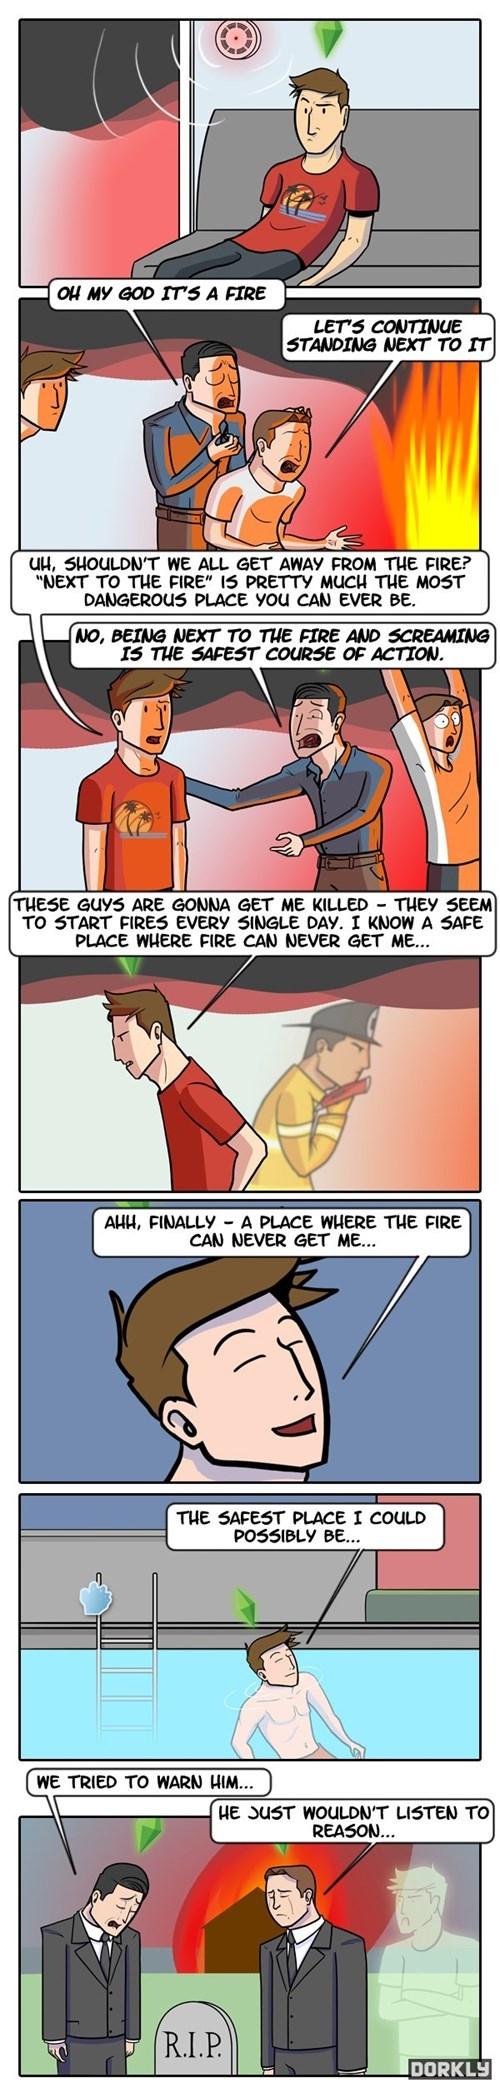 dorkly comics Sims - 7704348672